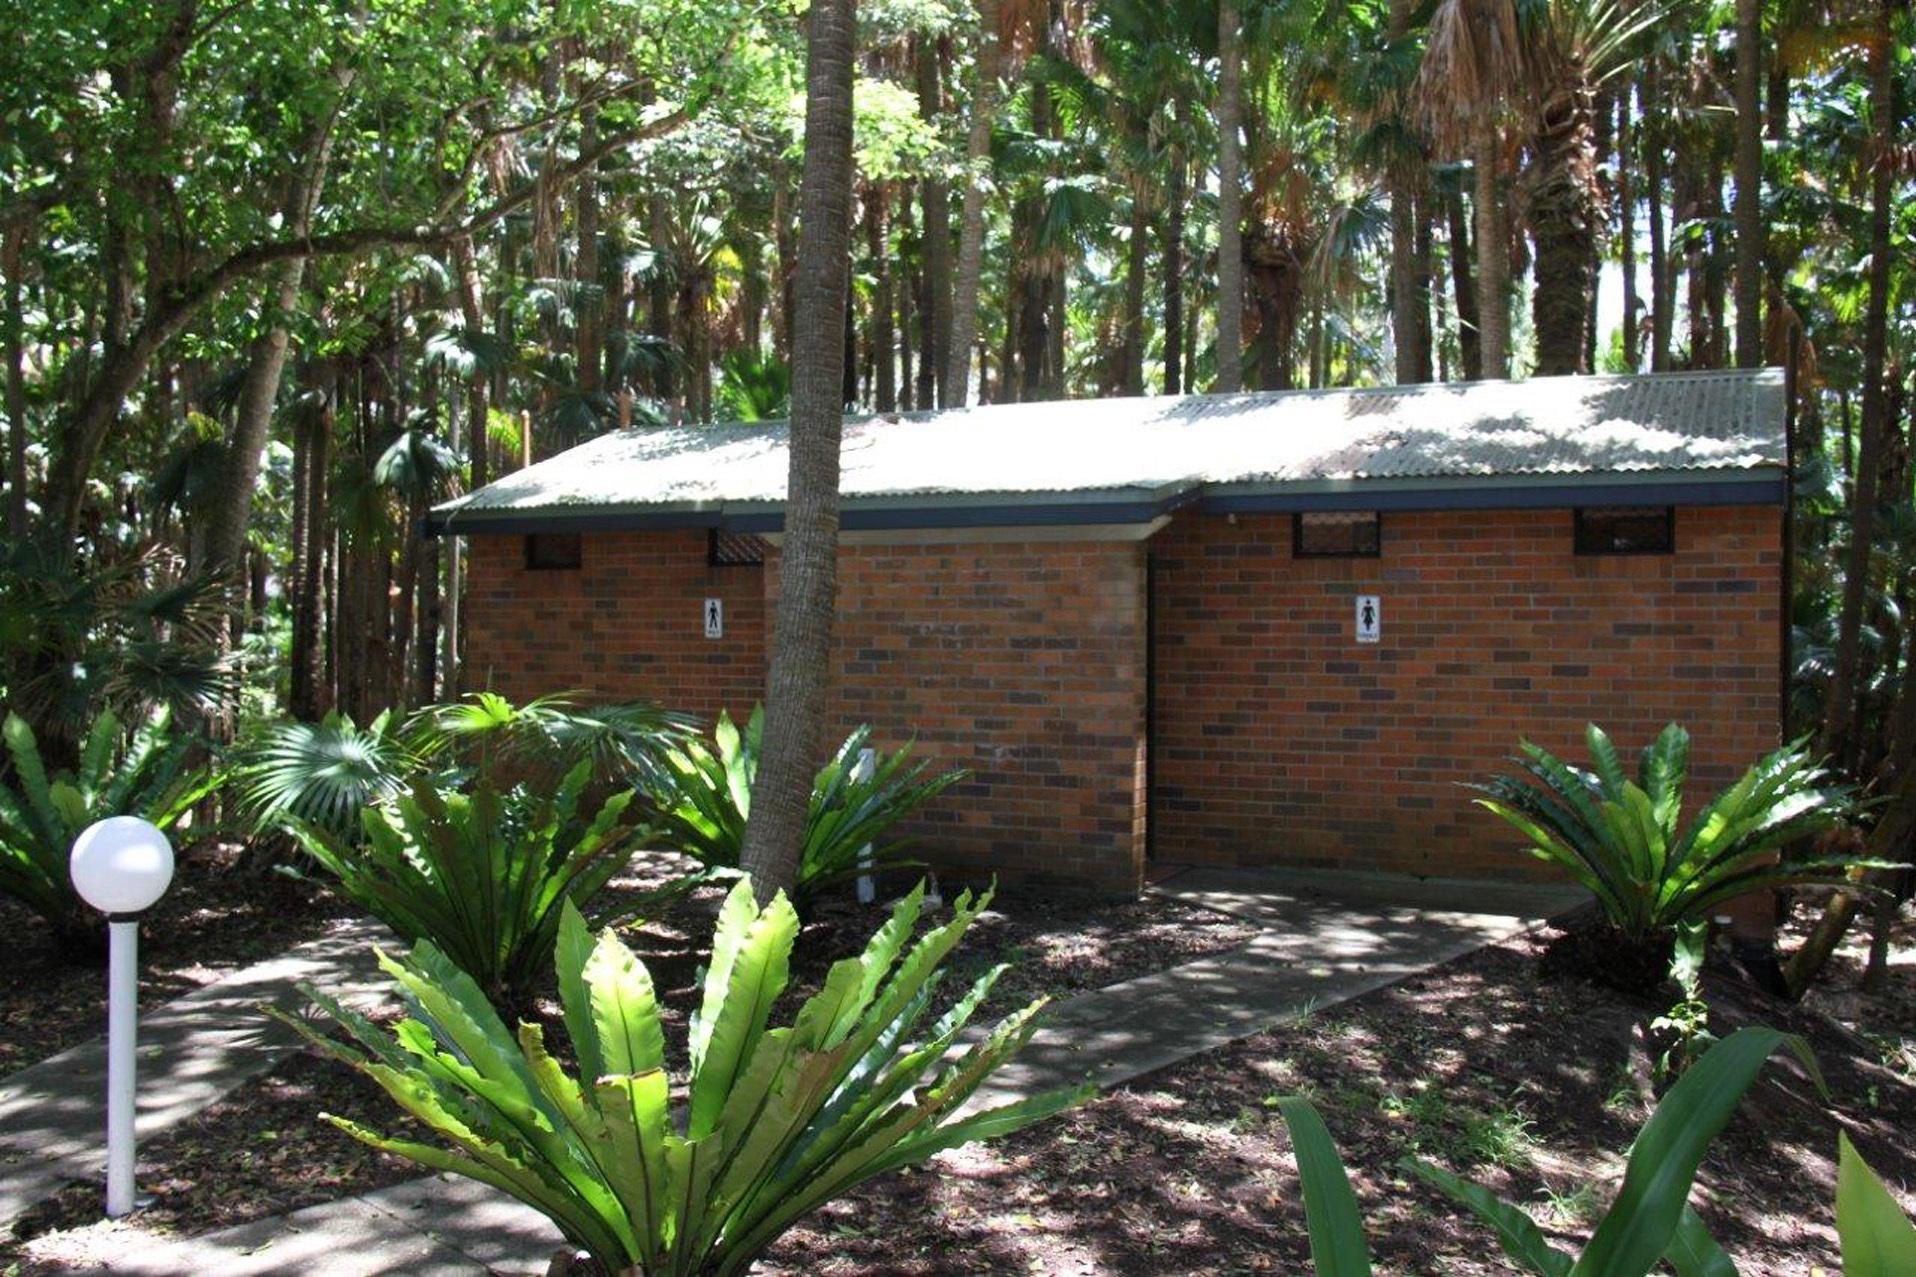 o - Tiona Palms Caravan Park